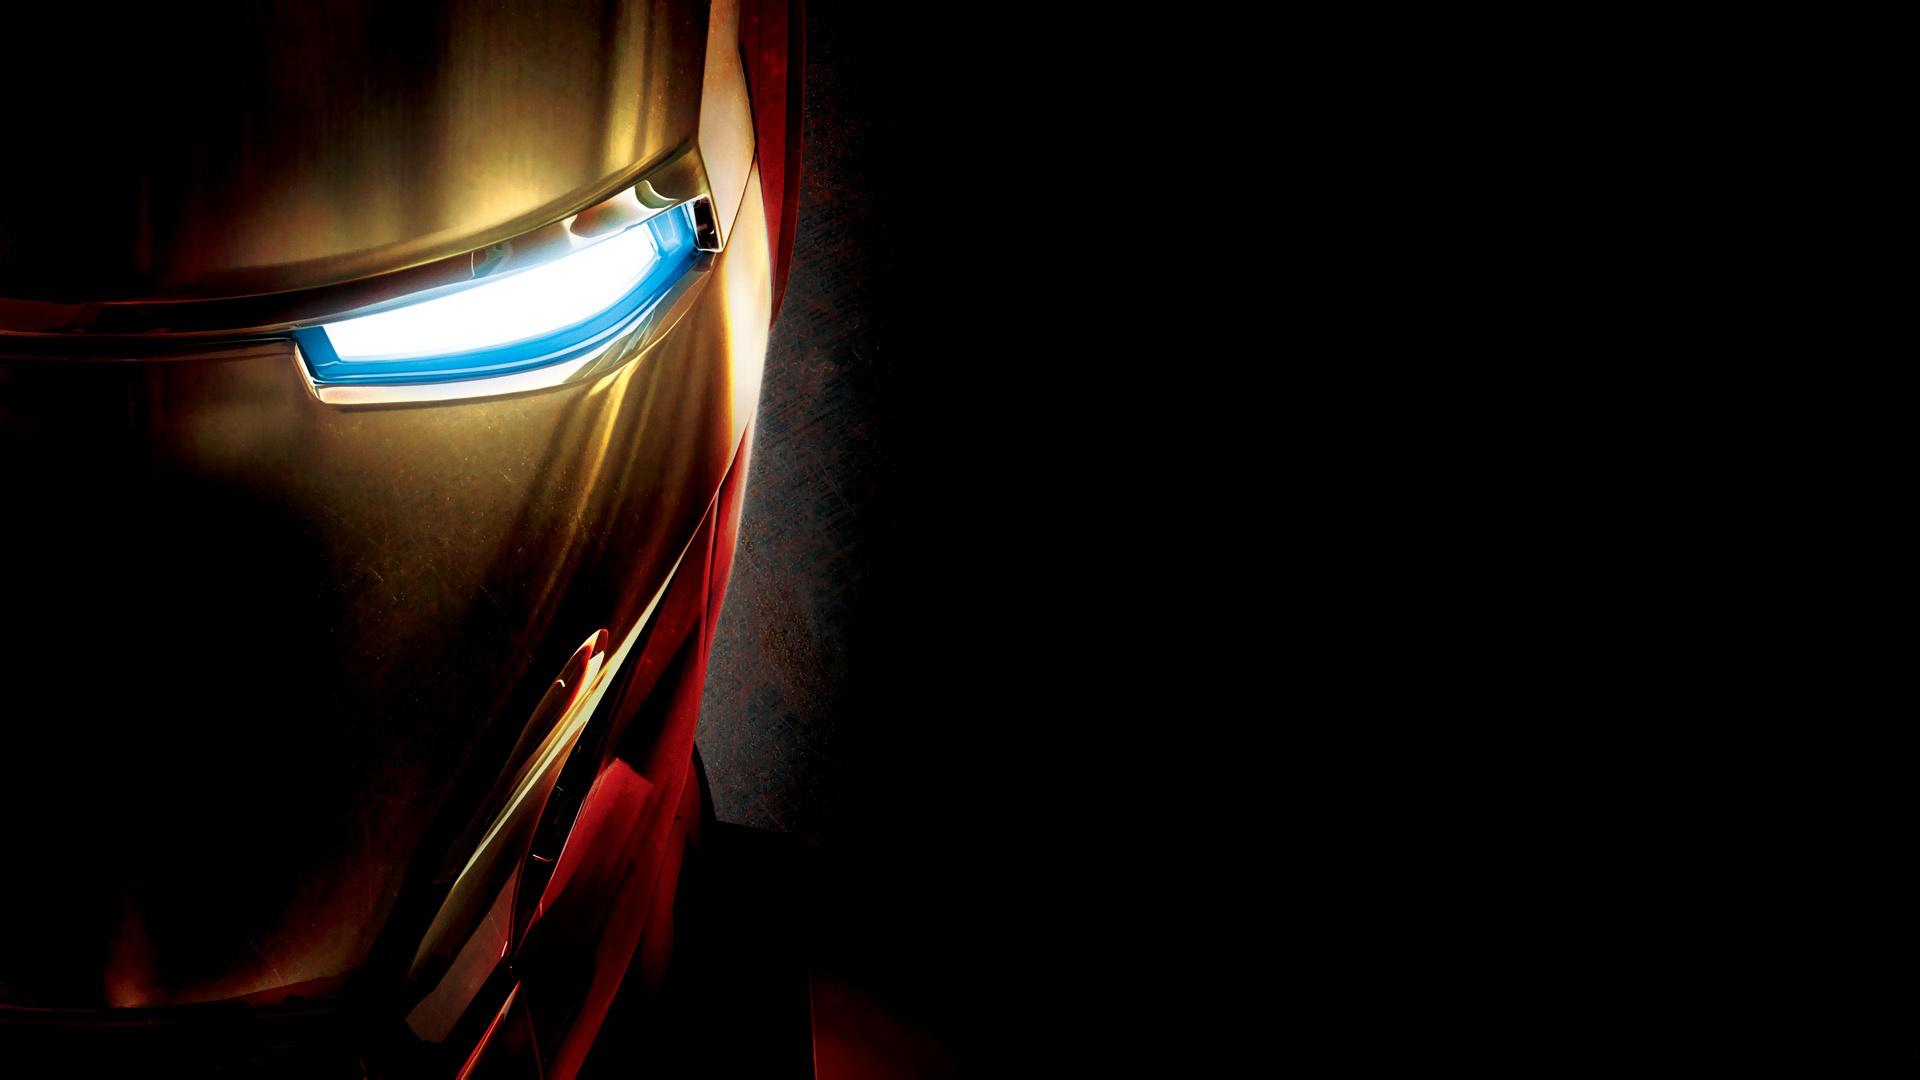 Imagenes De Ironman Para Fondo De Pantalla: Iron Man Full HD Fondo De Pantalla And Fondo De Escritorio